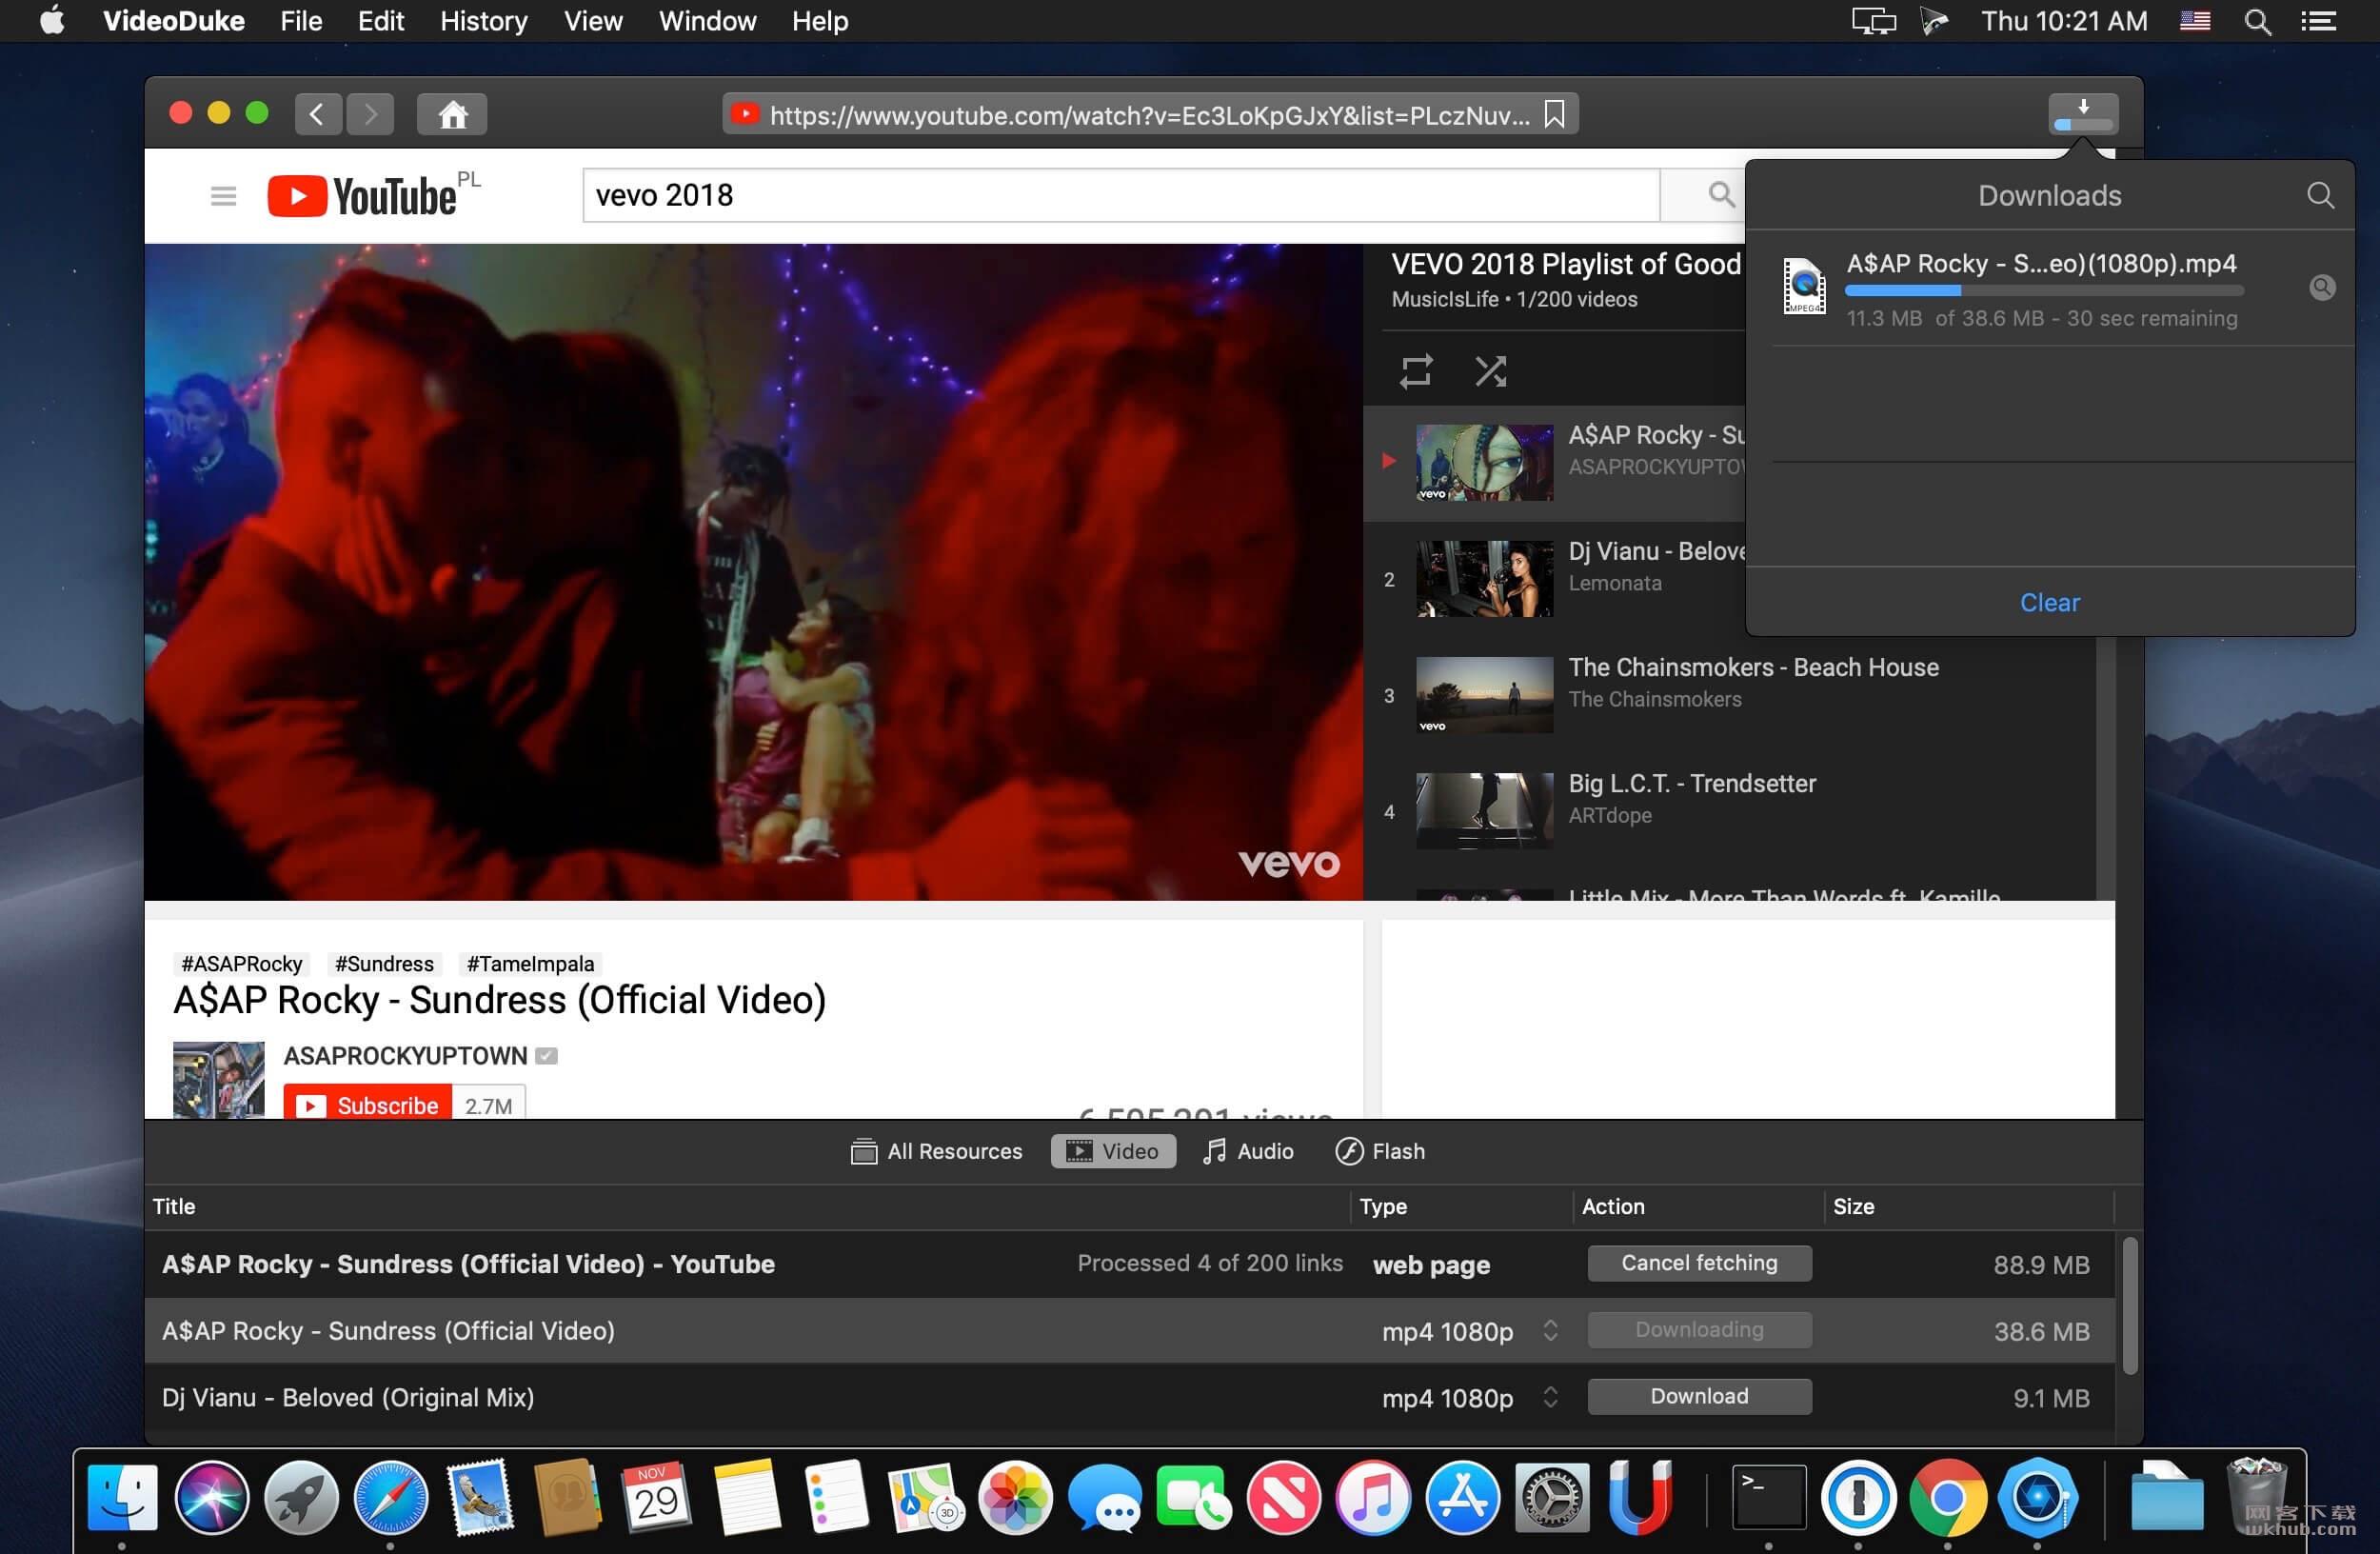 VideoDuke 1.2(228) 流行视频网站视频下载工具